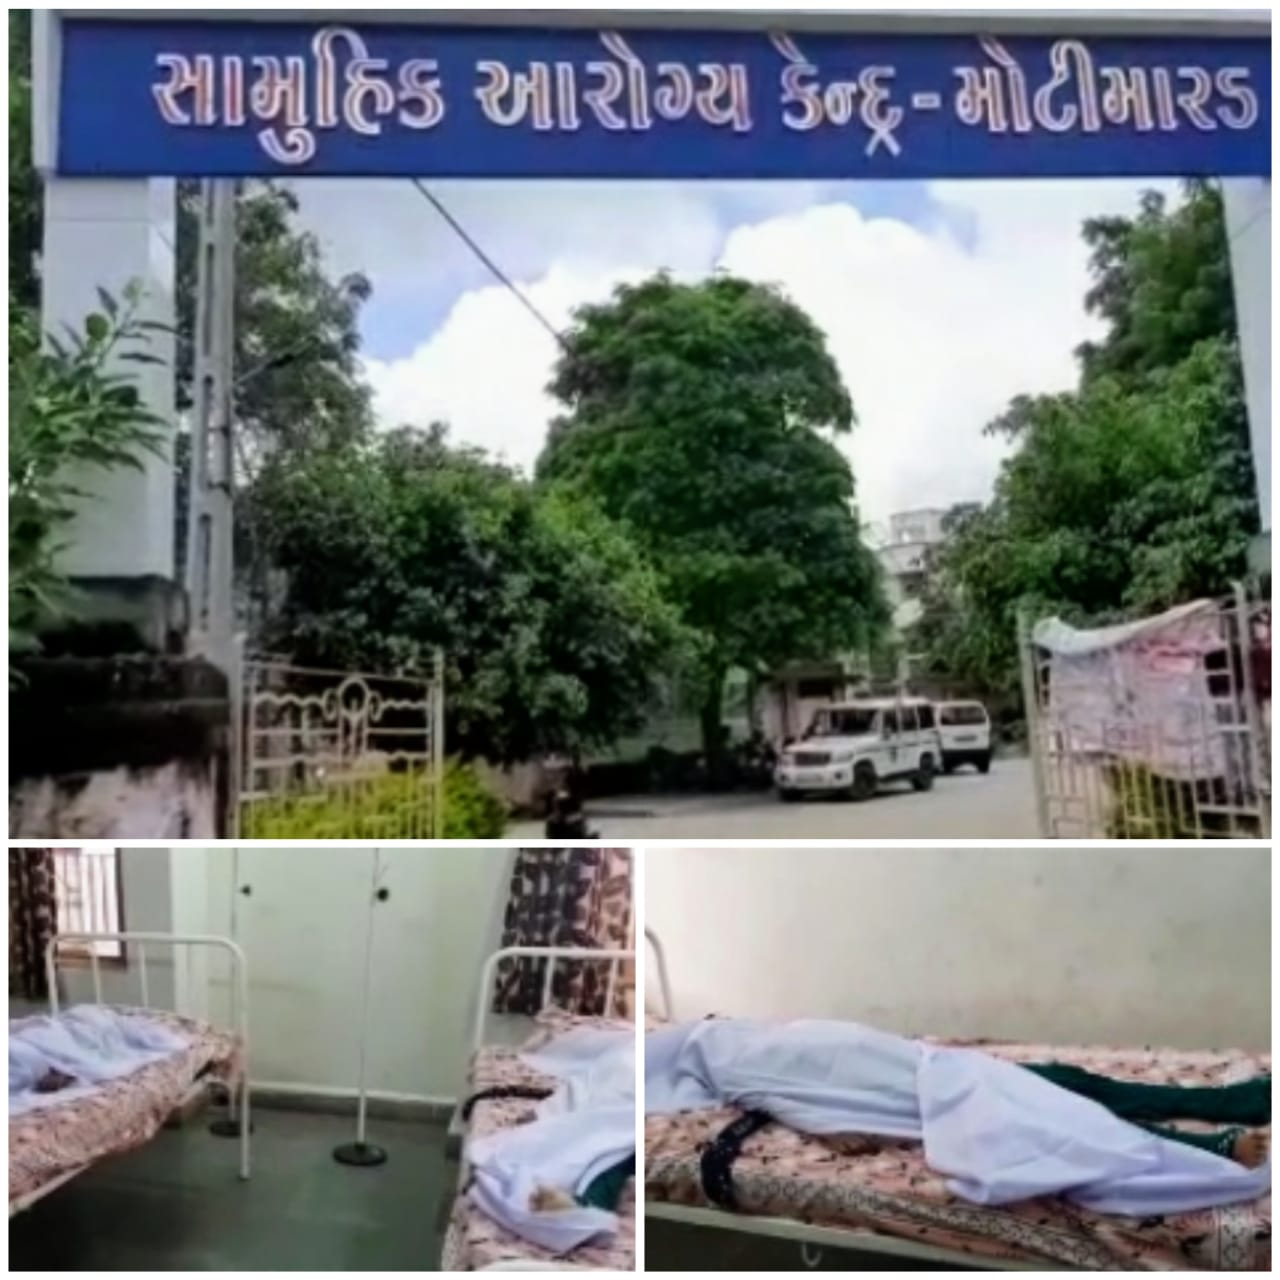 Dhoraji-Rajkot રાજકોટ જીલ્લાનાં ધોરાજી ભાડેરમાં સામૂહિક આત્મહત્યાને અંજામ આપે એ પહેલા ત્રણને બચાવાયા, બેના મૃત્યુ.